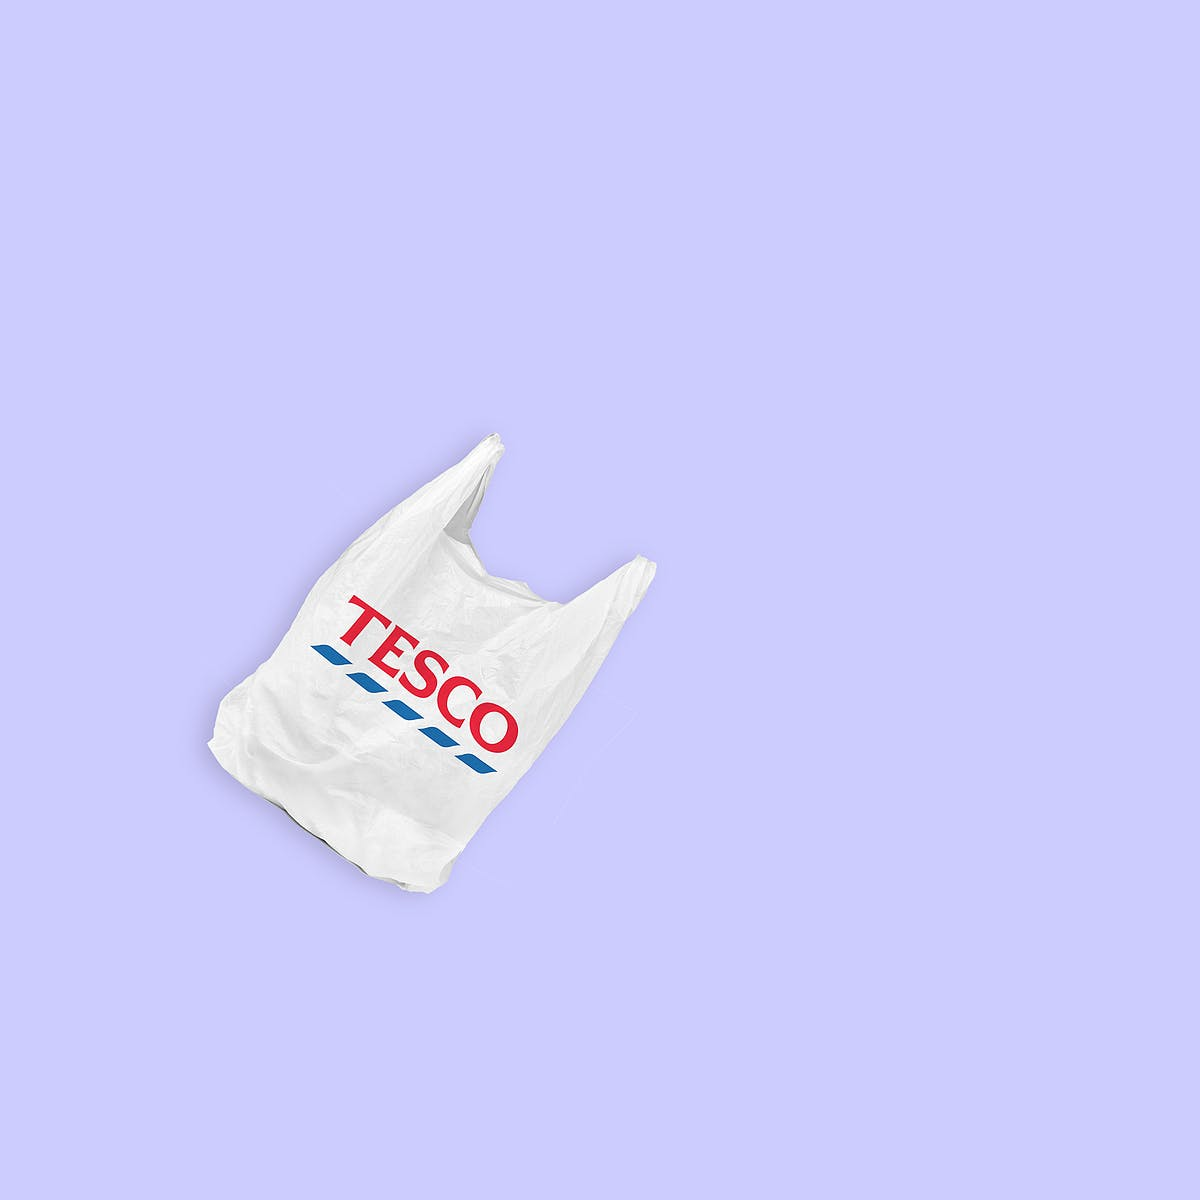 Task01 Tesco Reactive Campaign Header Still 0 00 00 00